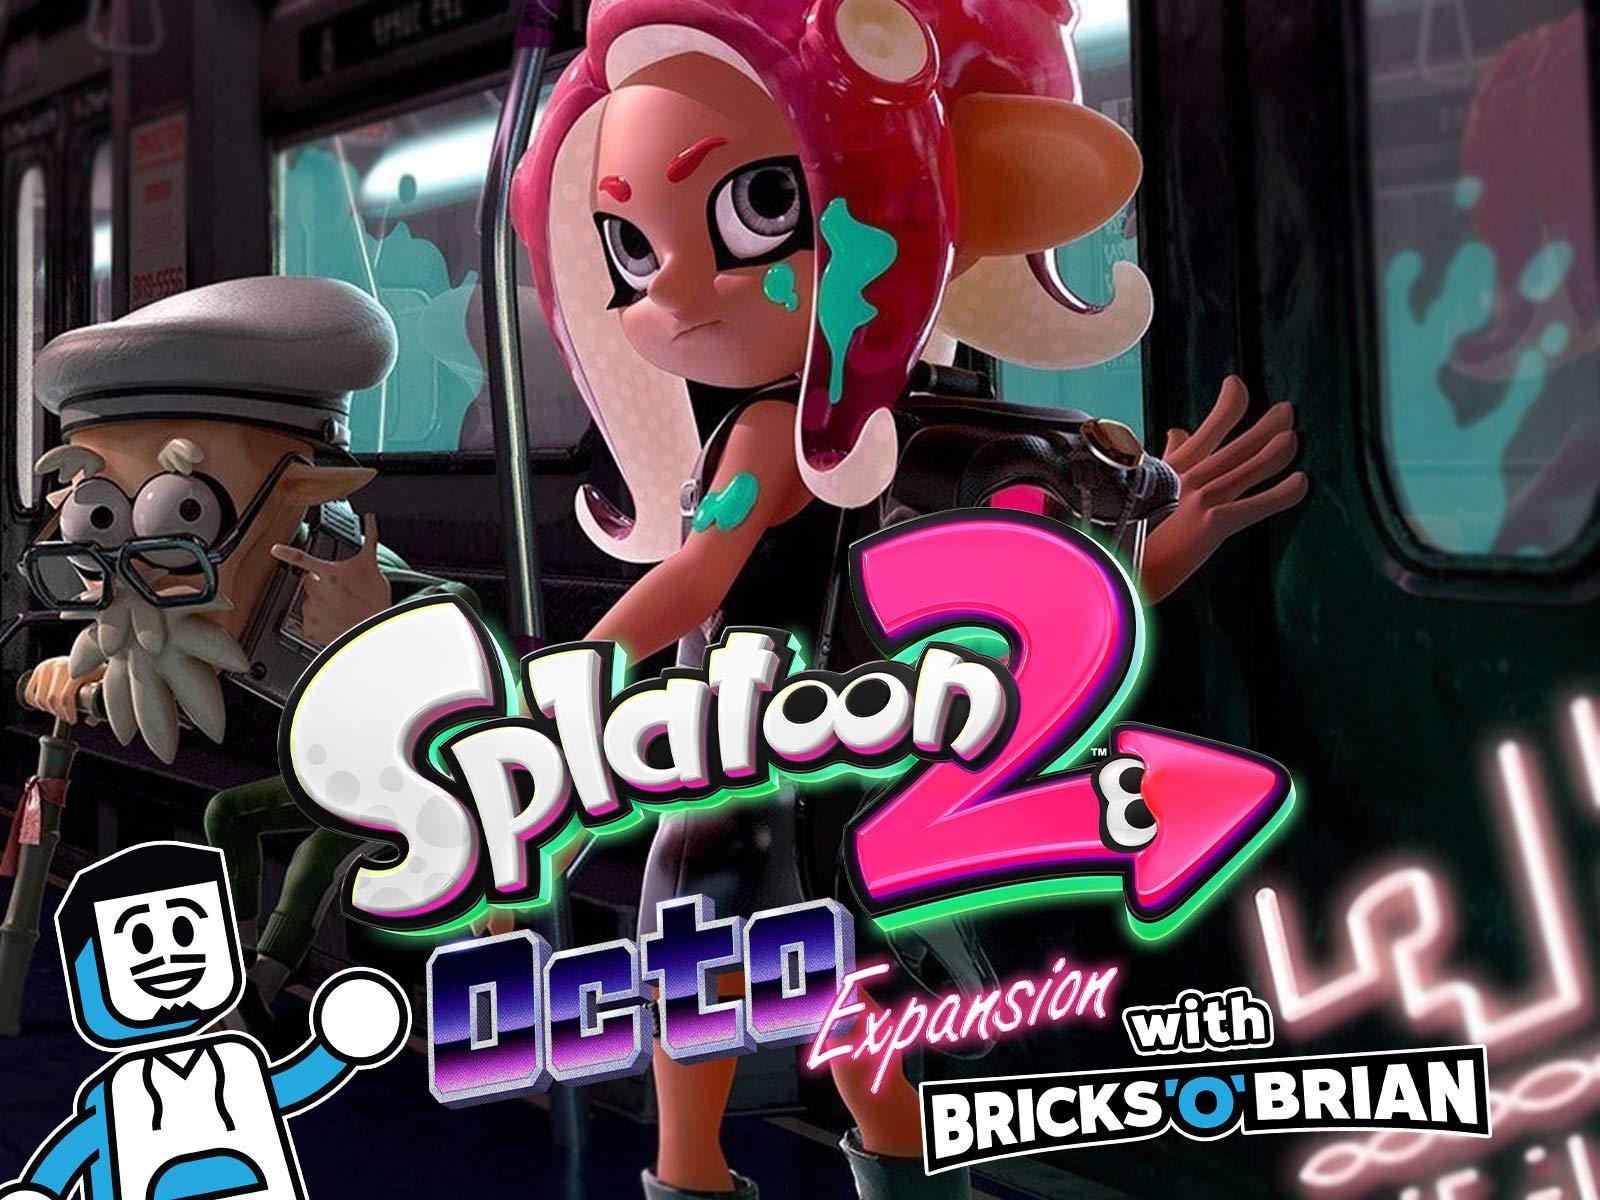 Clip: Splatoon 2 Octo-Expansion with Bricks 'O' Brian! - Season 1